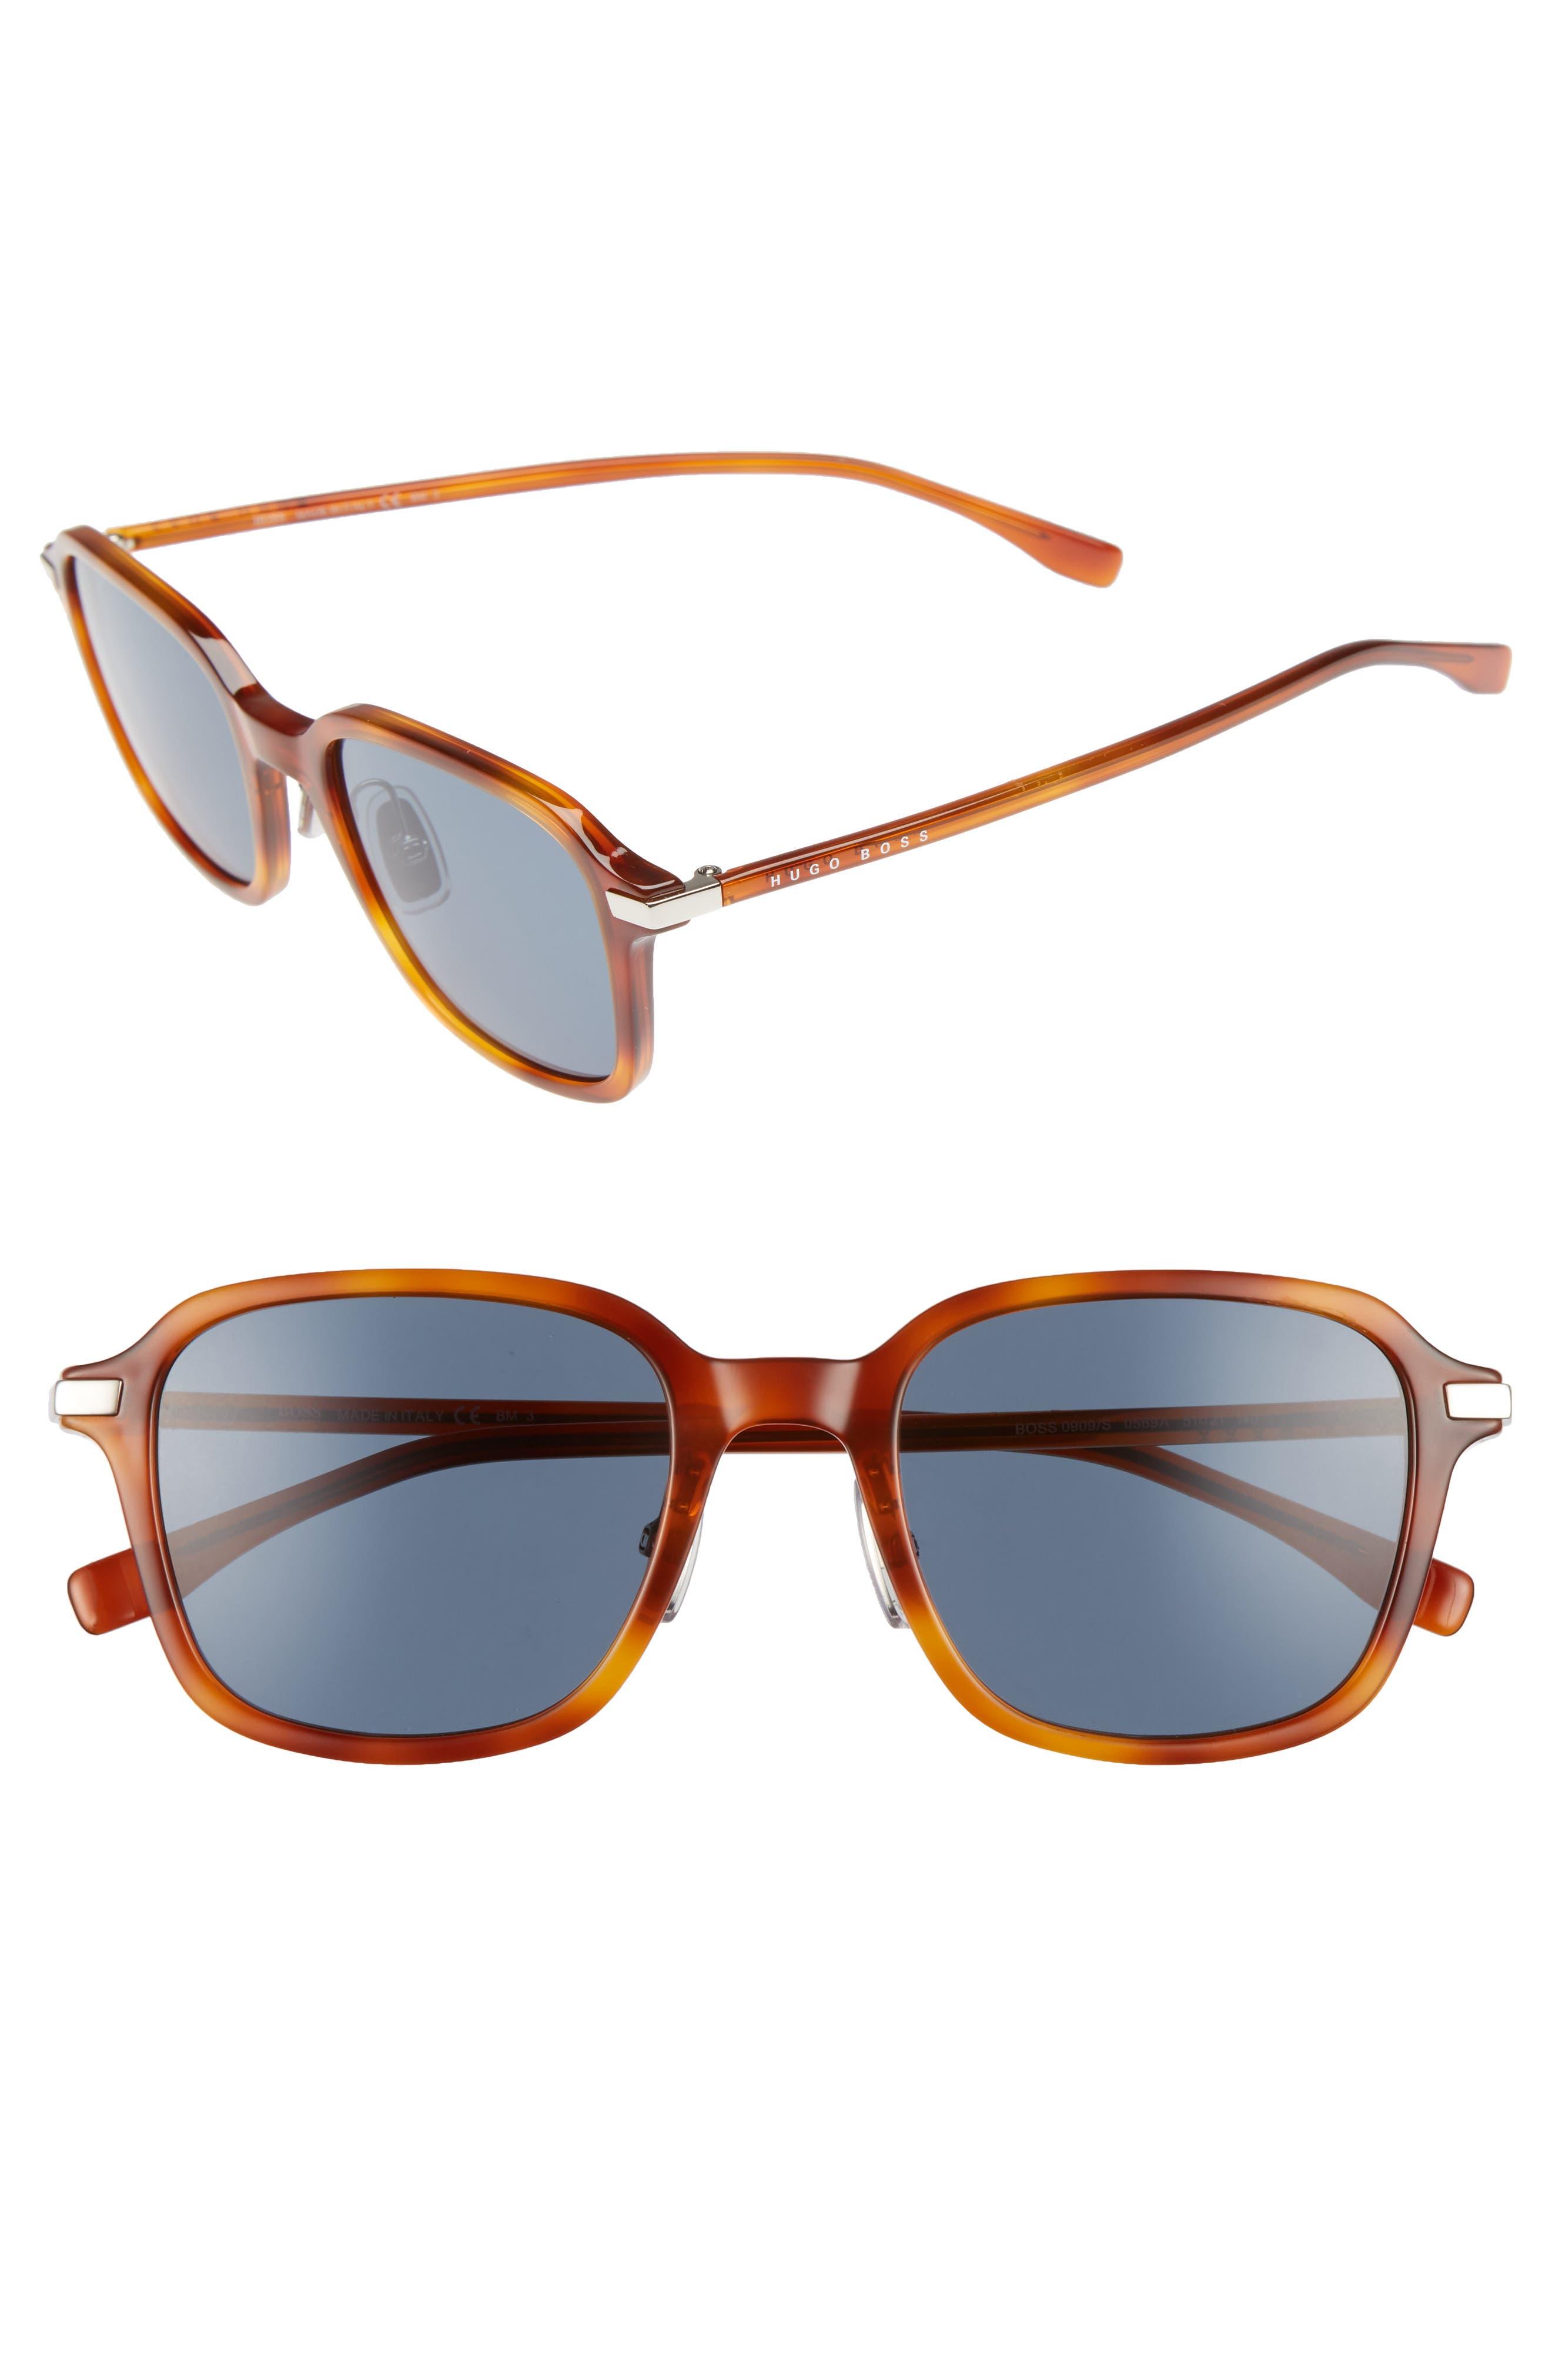 0909S 51mm Sunglasses,                             Main thumbnail 1, color,                             210